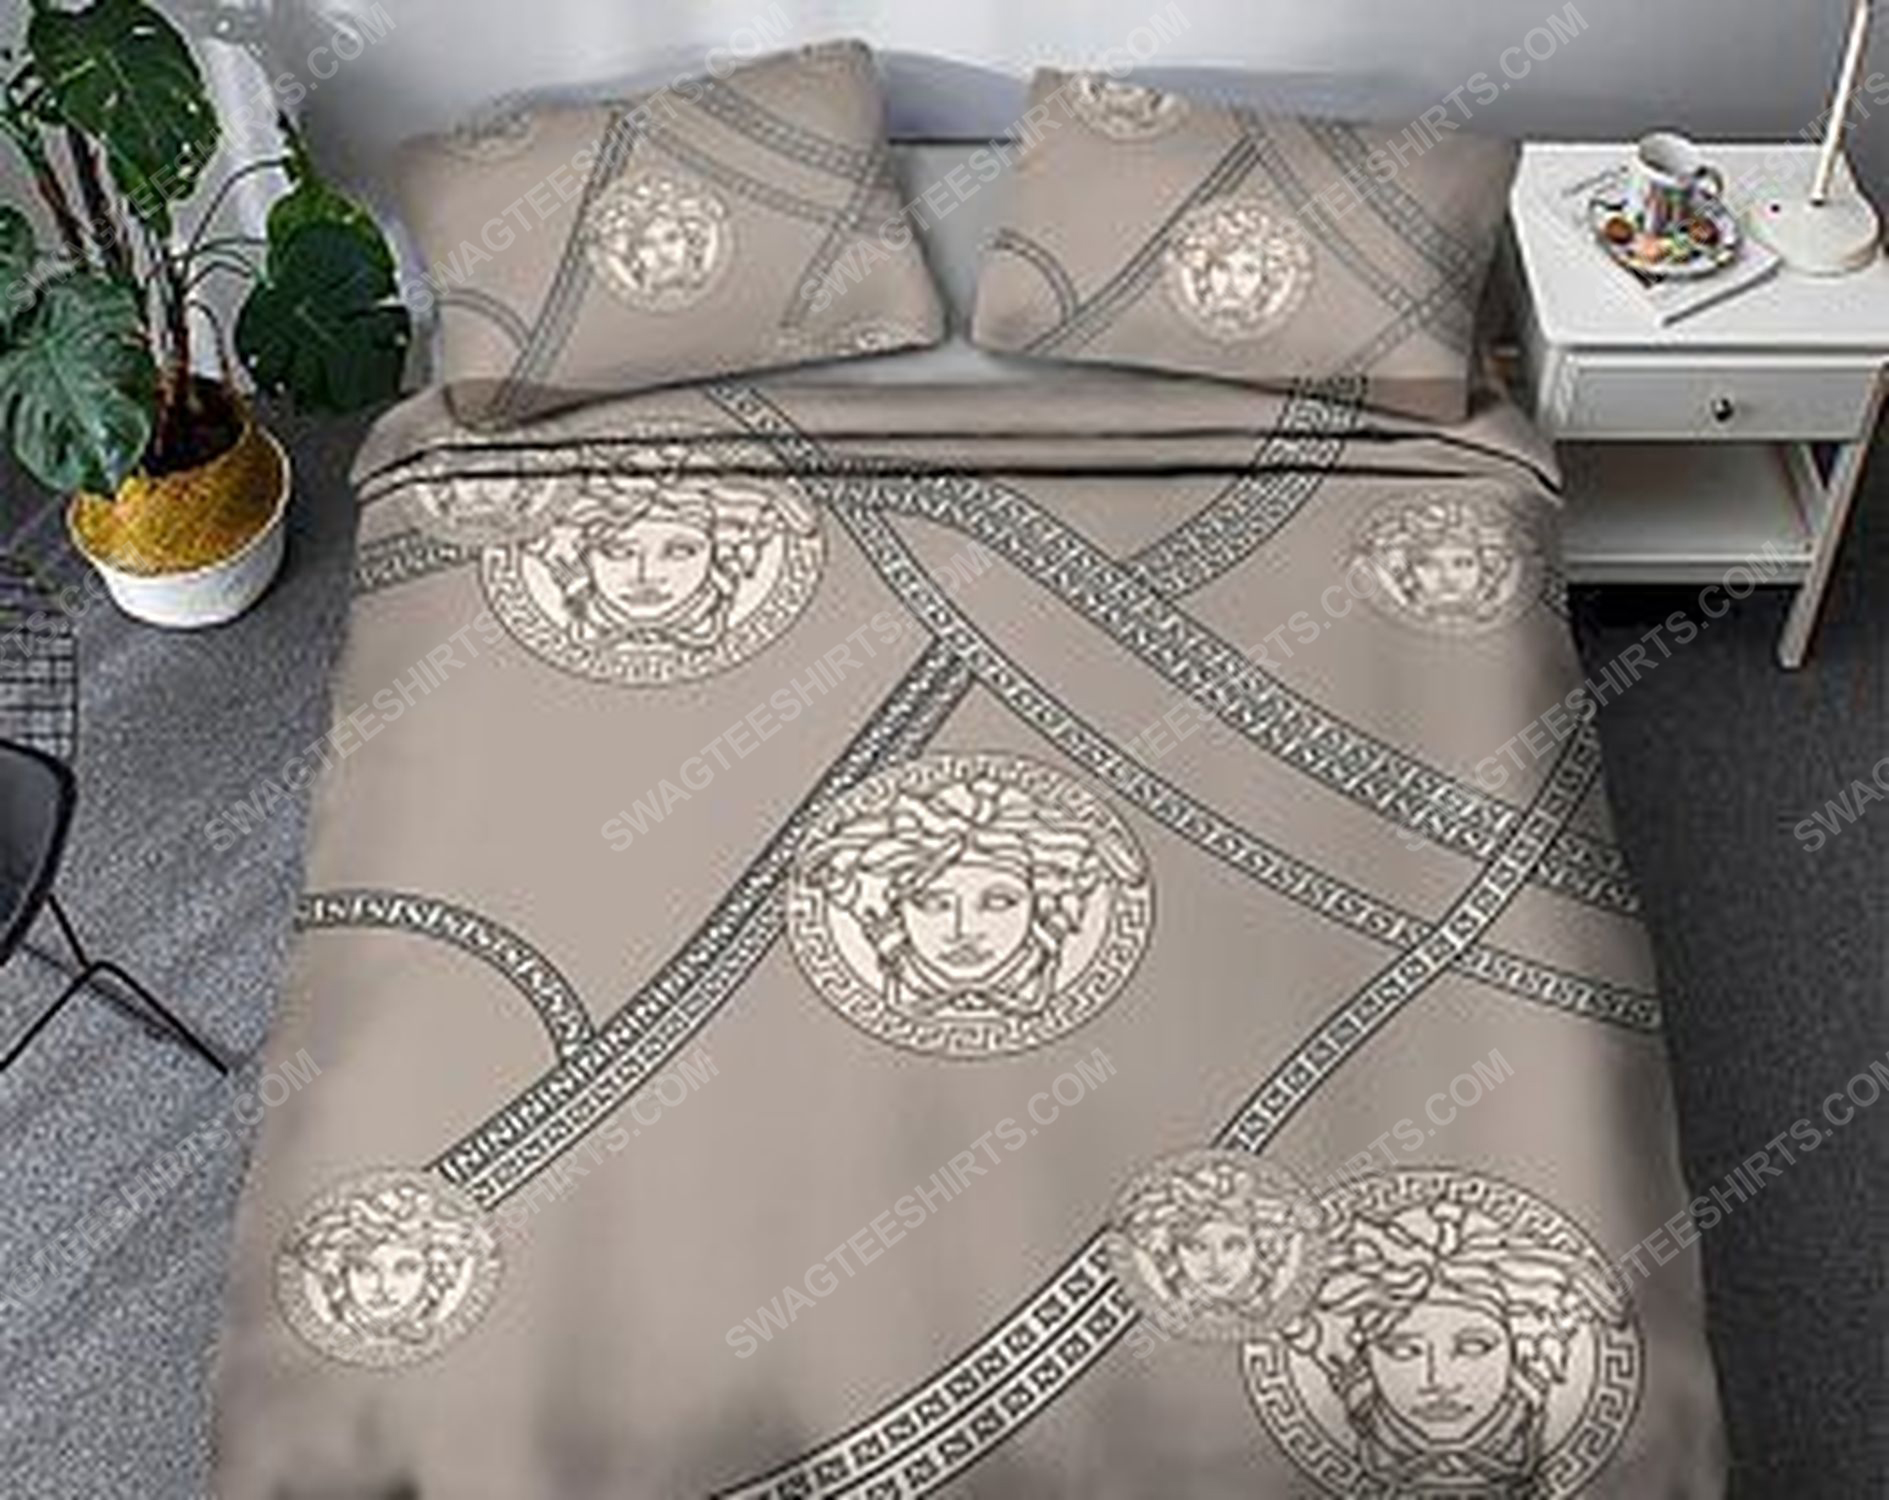 Versace luxury version full print duvet cover bedding set 3 - Copy